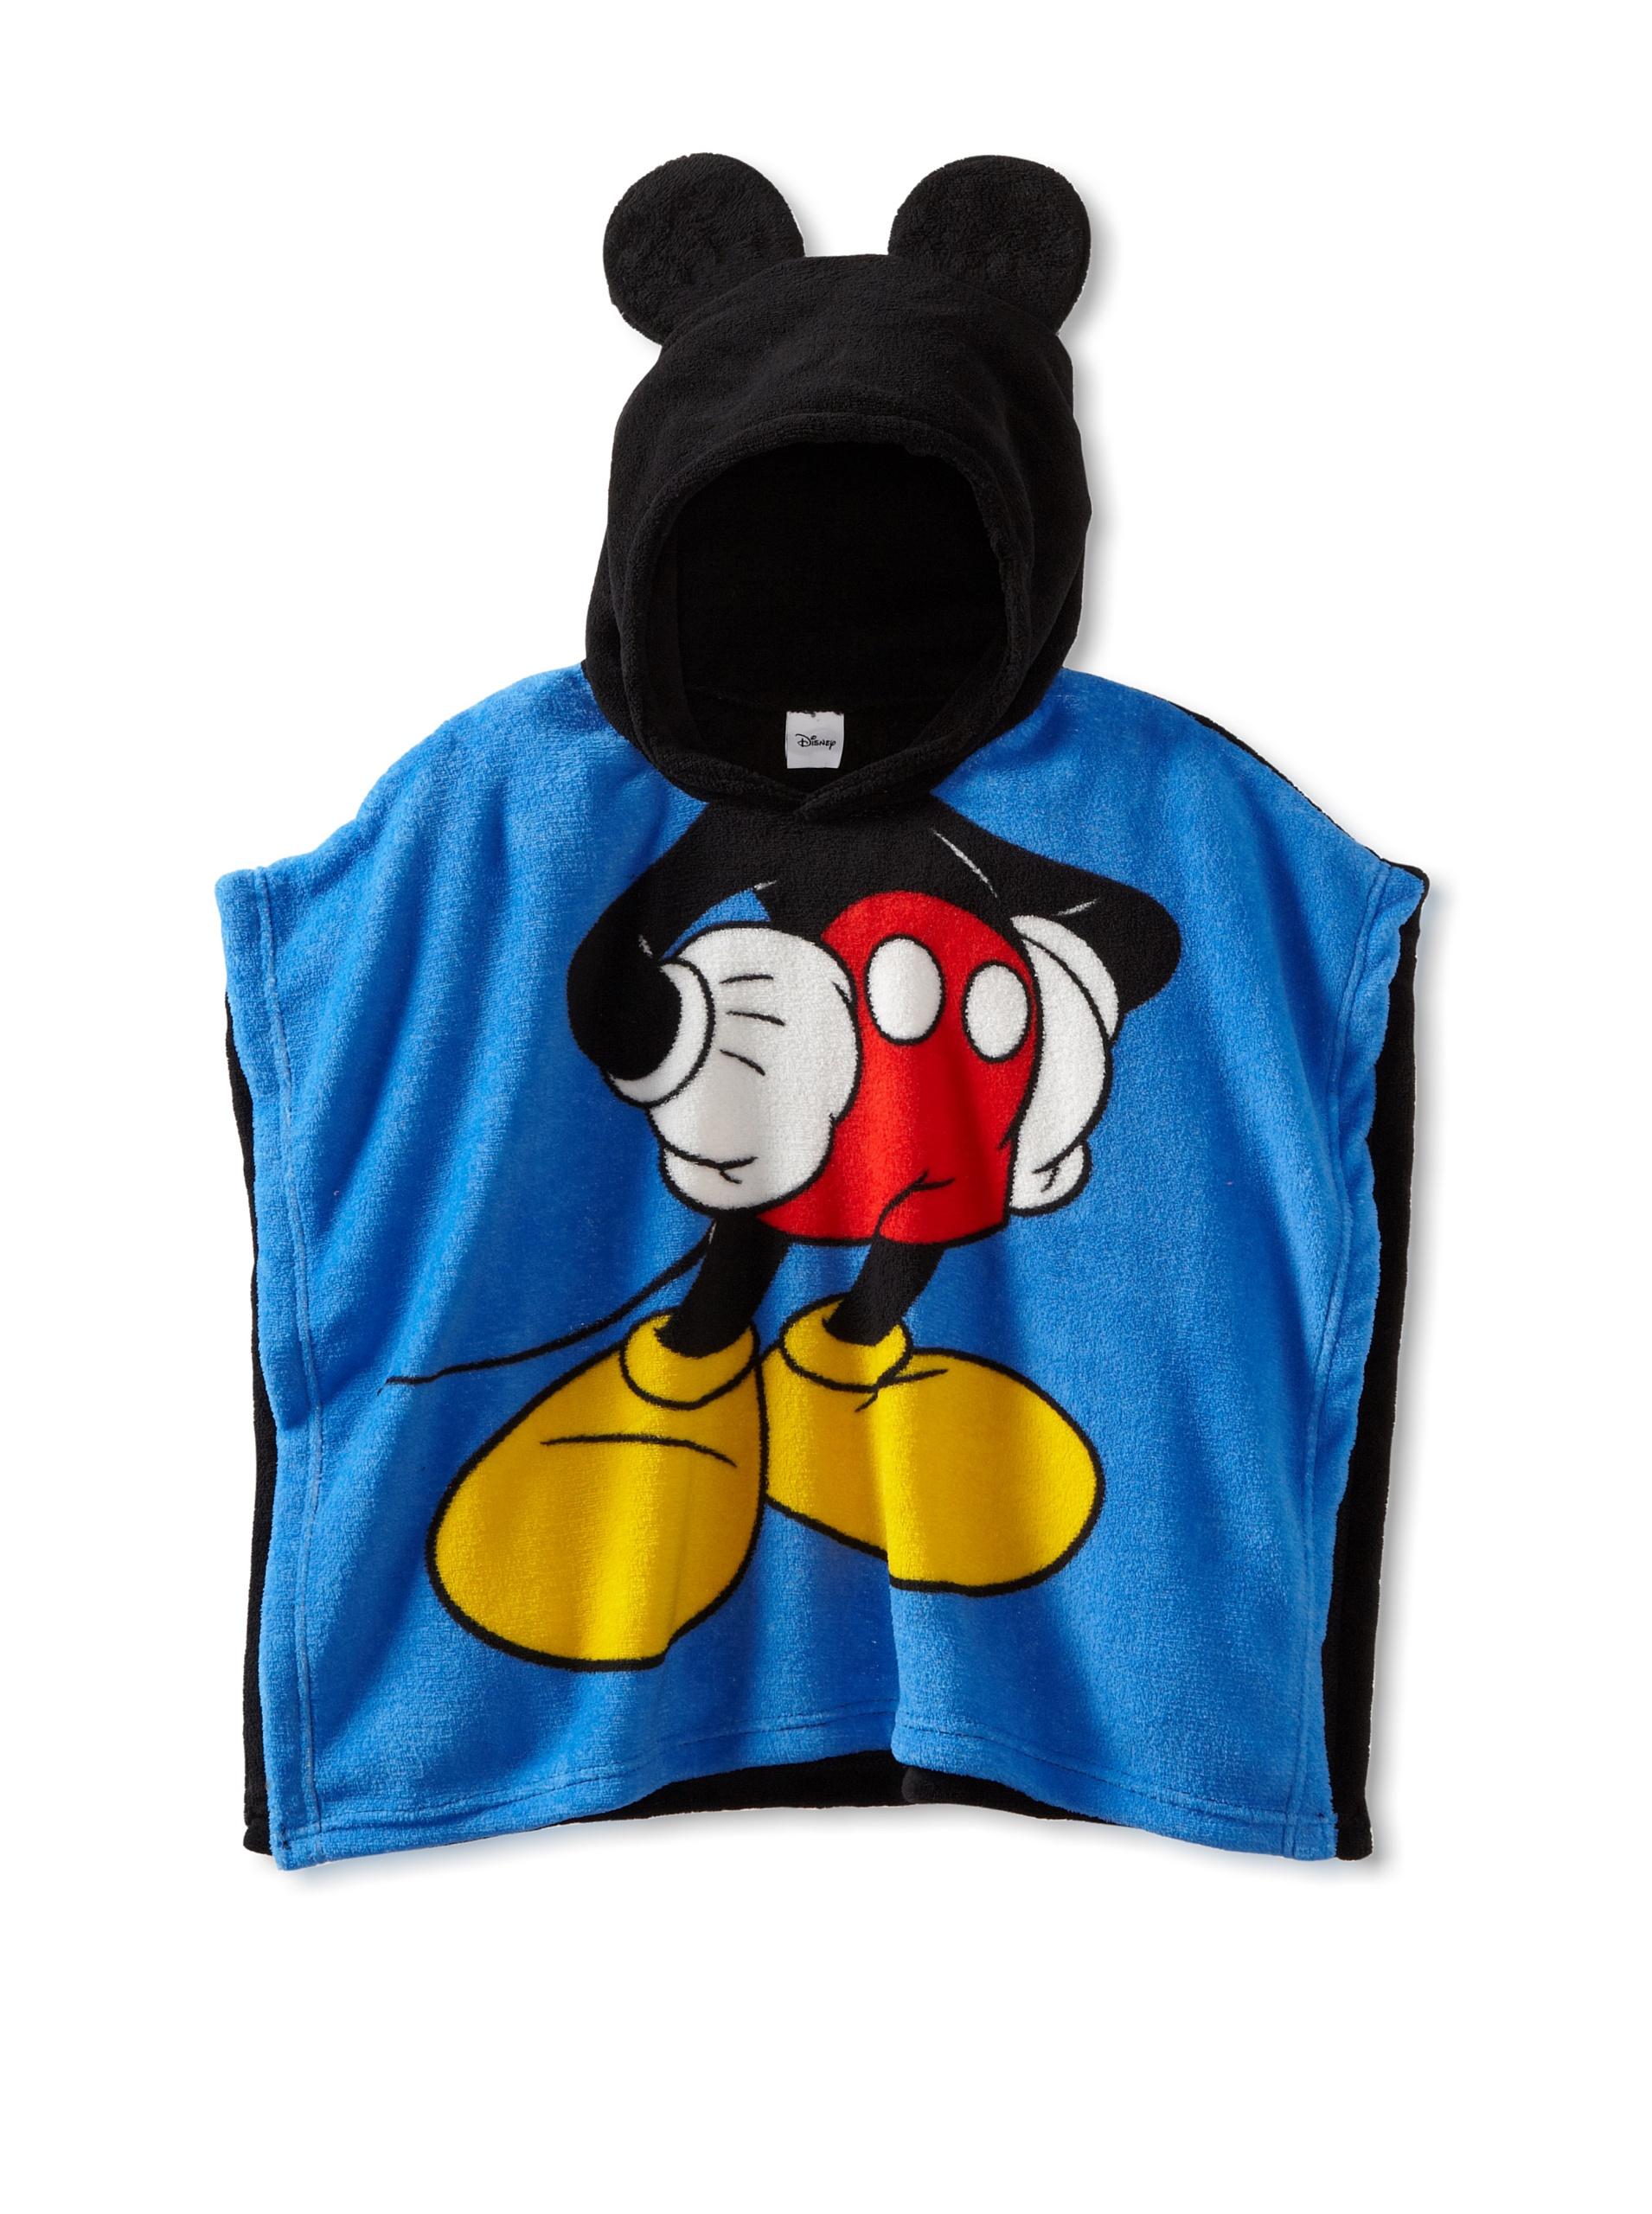 Disney ''Mickey Mouse'' Blue 21'' x 24'' Wrappie Hooded Fleece Blanket Poncho